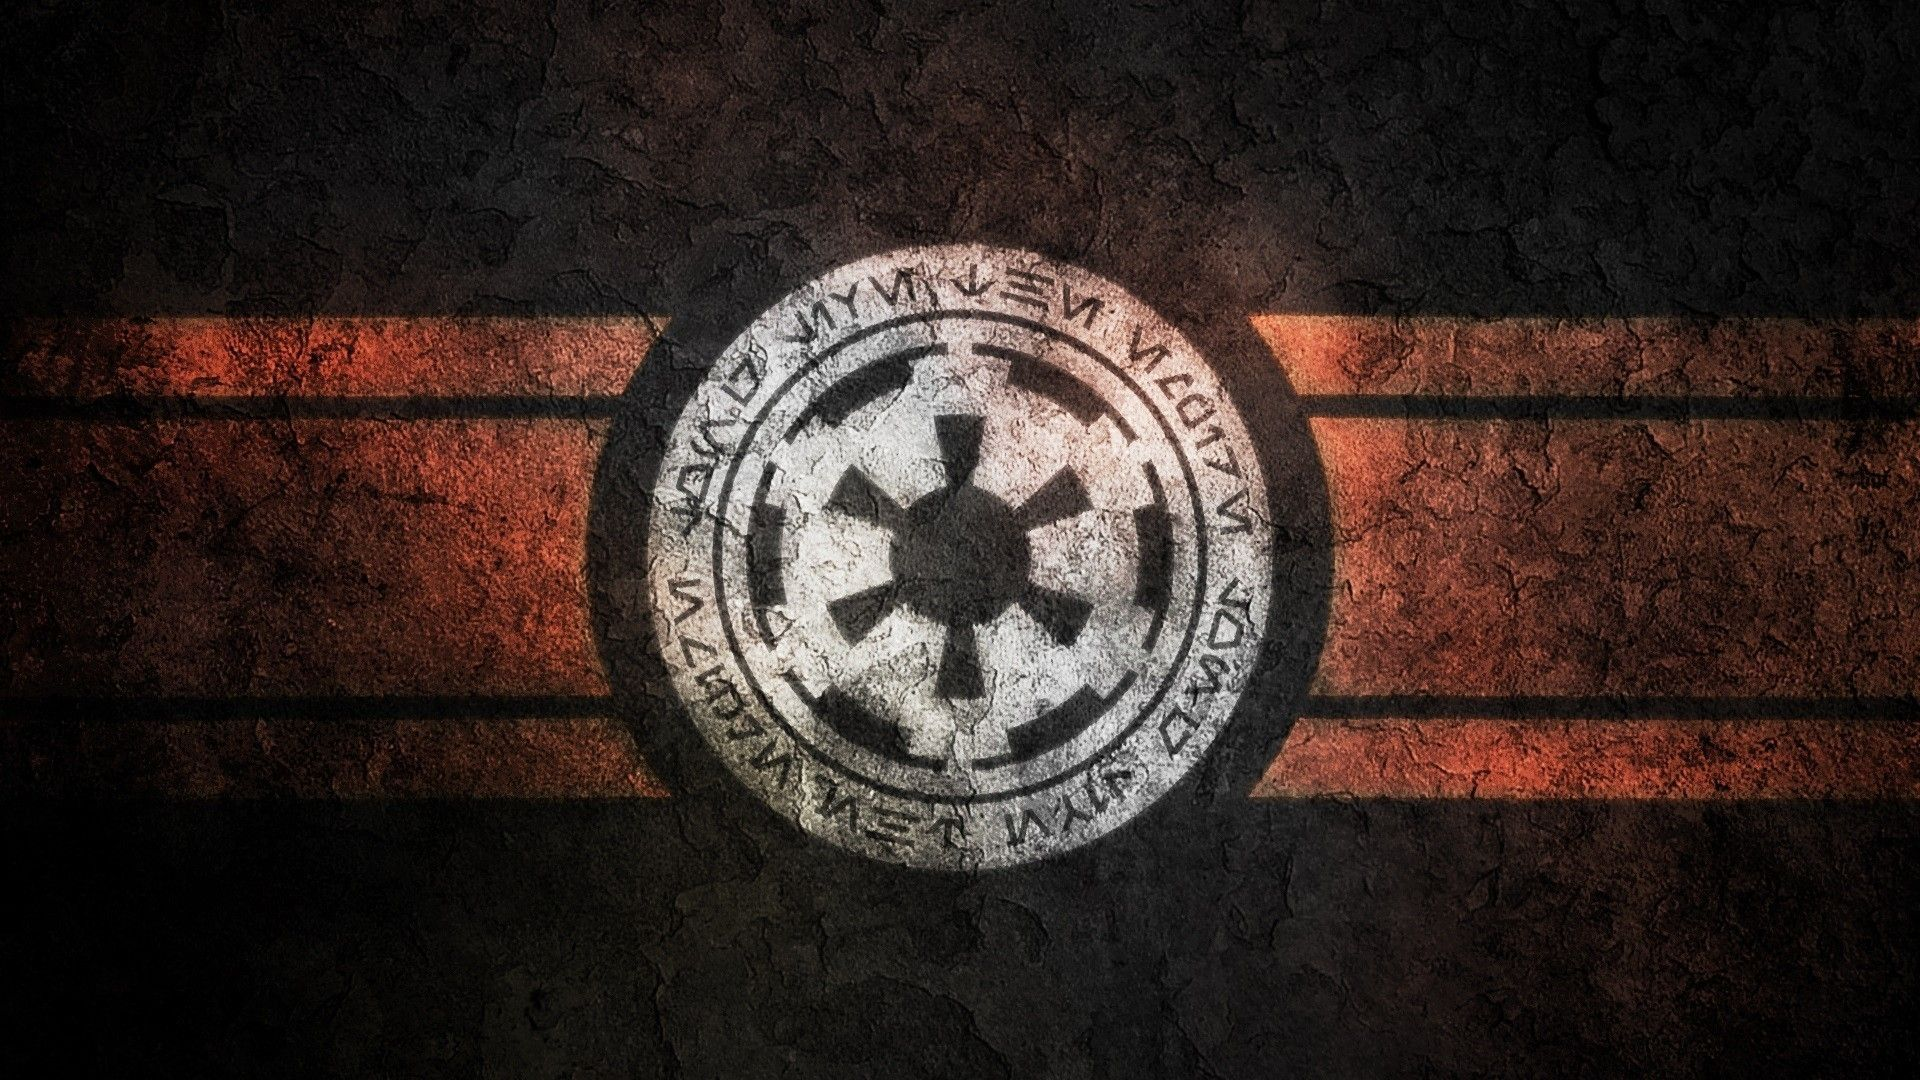 Minimalist Star Wars Empire Wallpapers Top Free Minimalist Star Wars Empire Backgrounds Wallpaperaccess